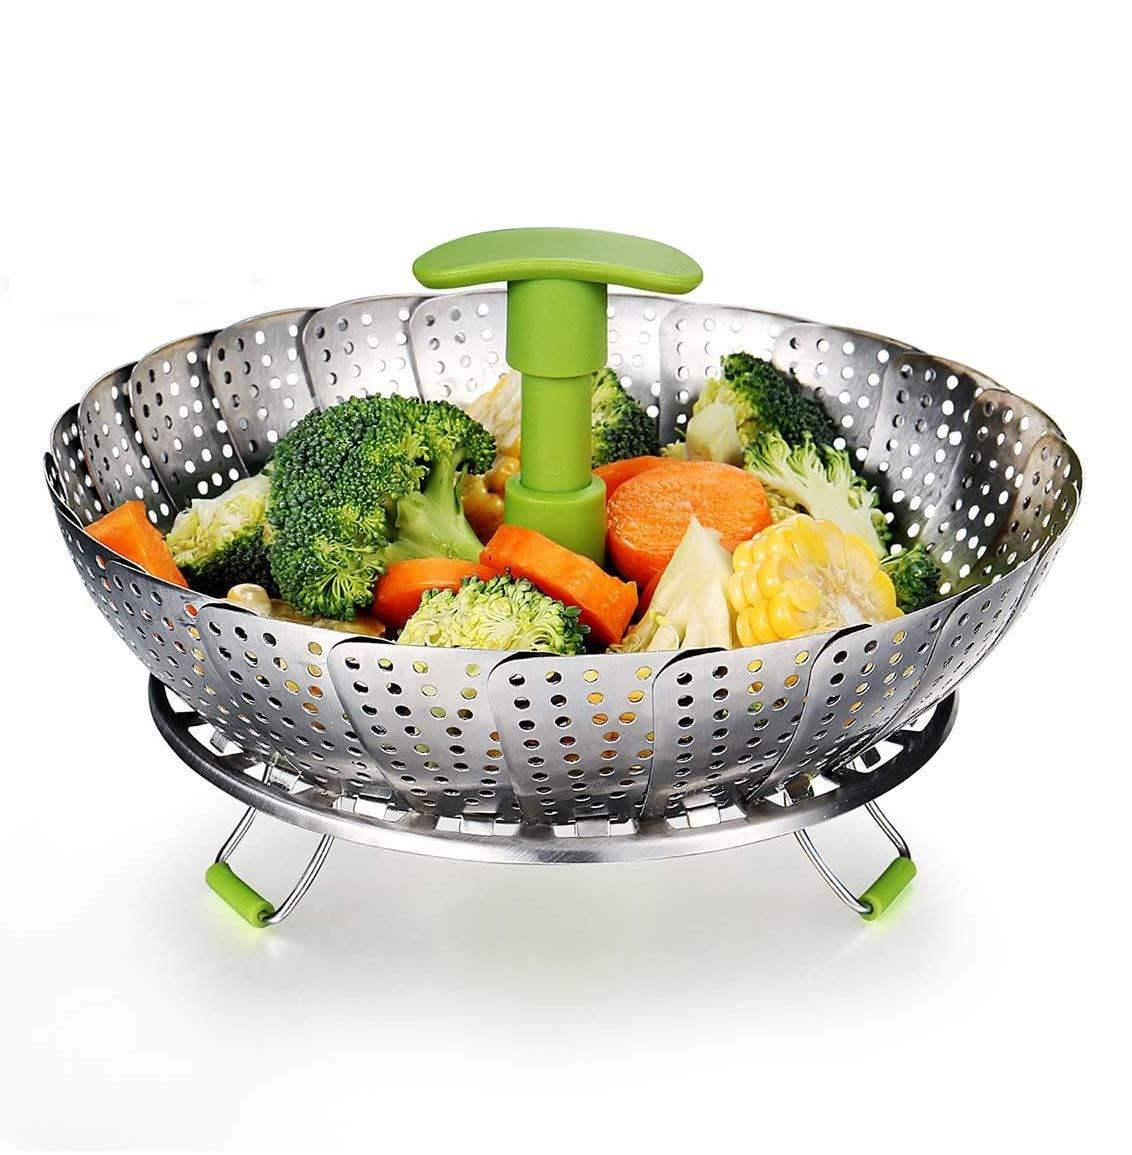 Stainless Steel Steamer Basket